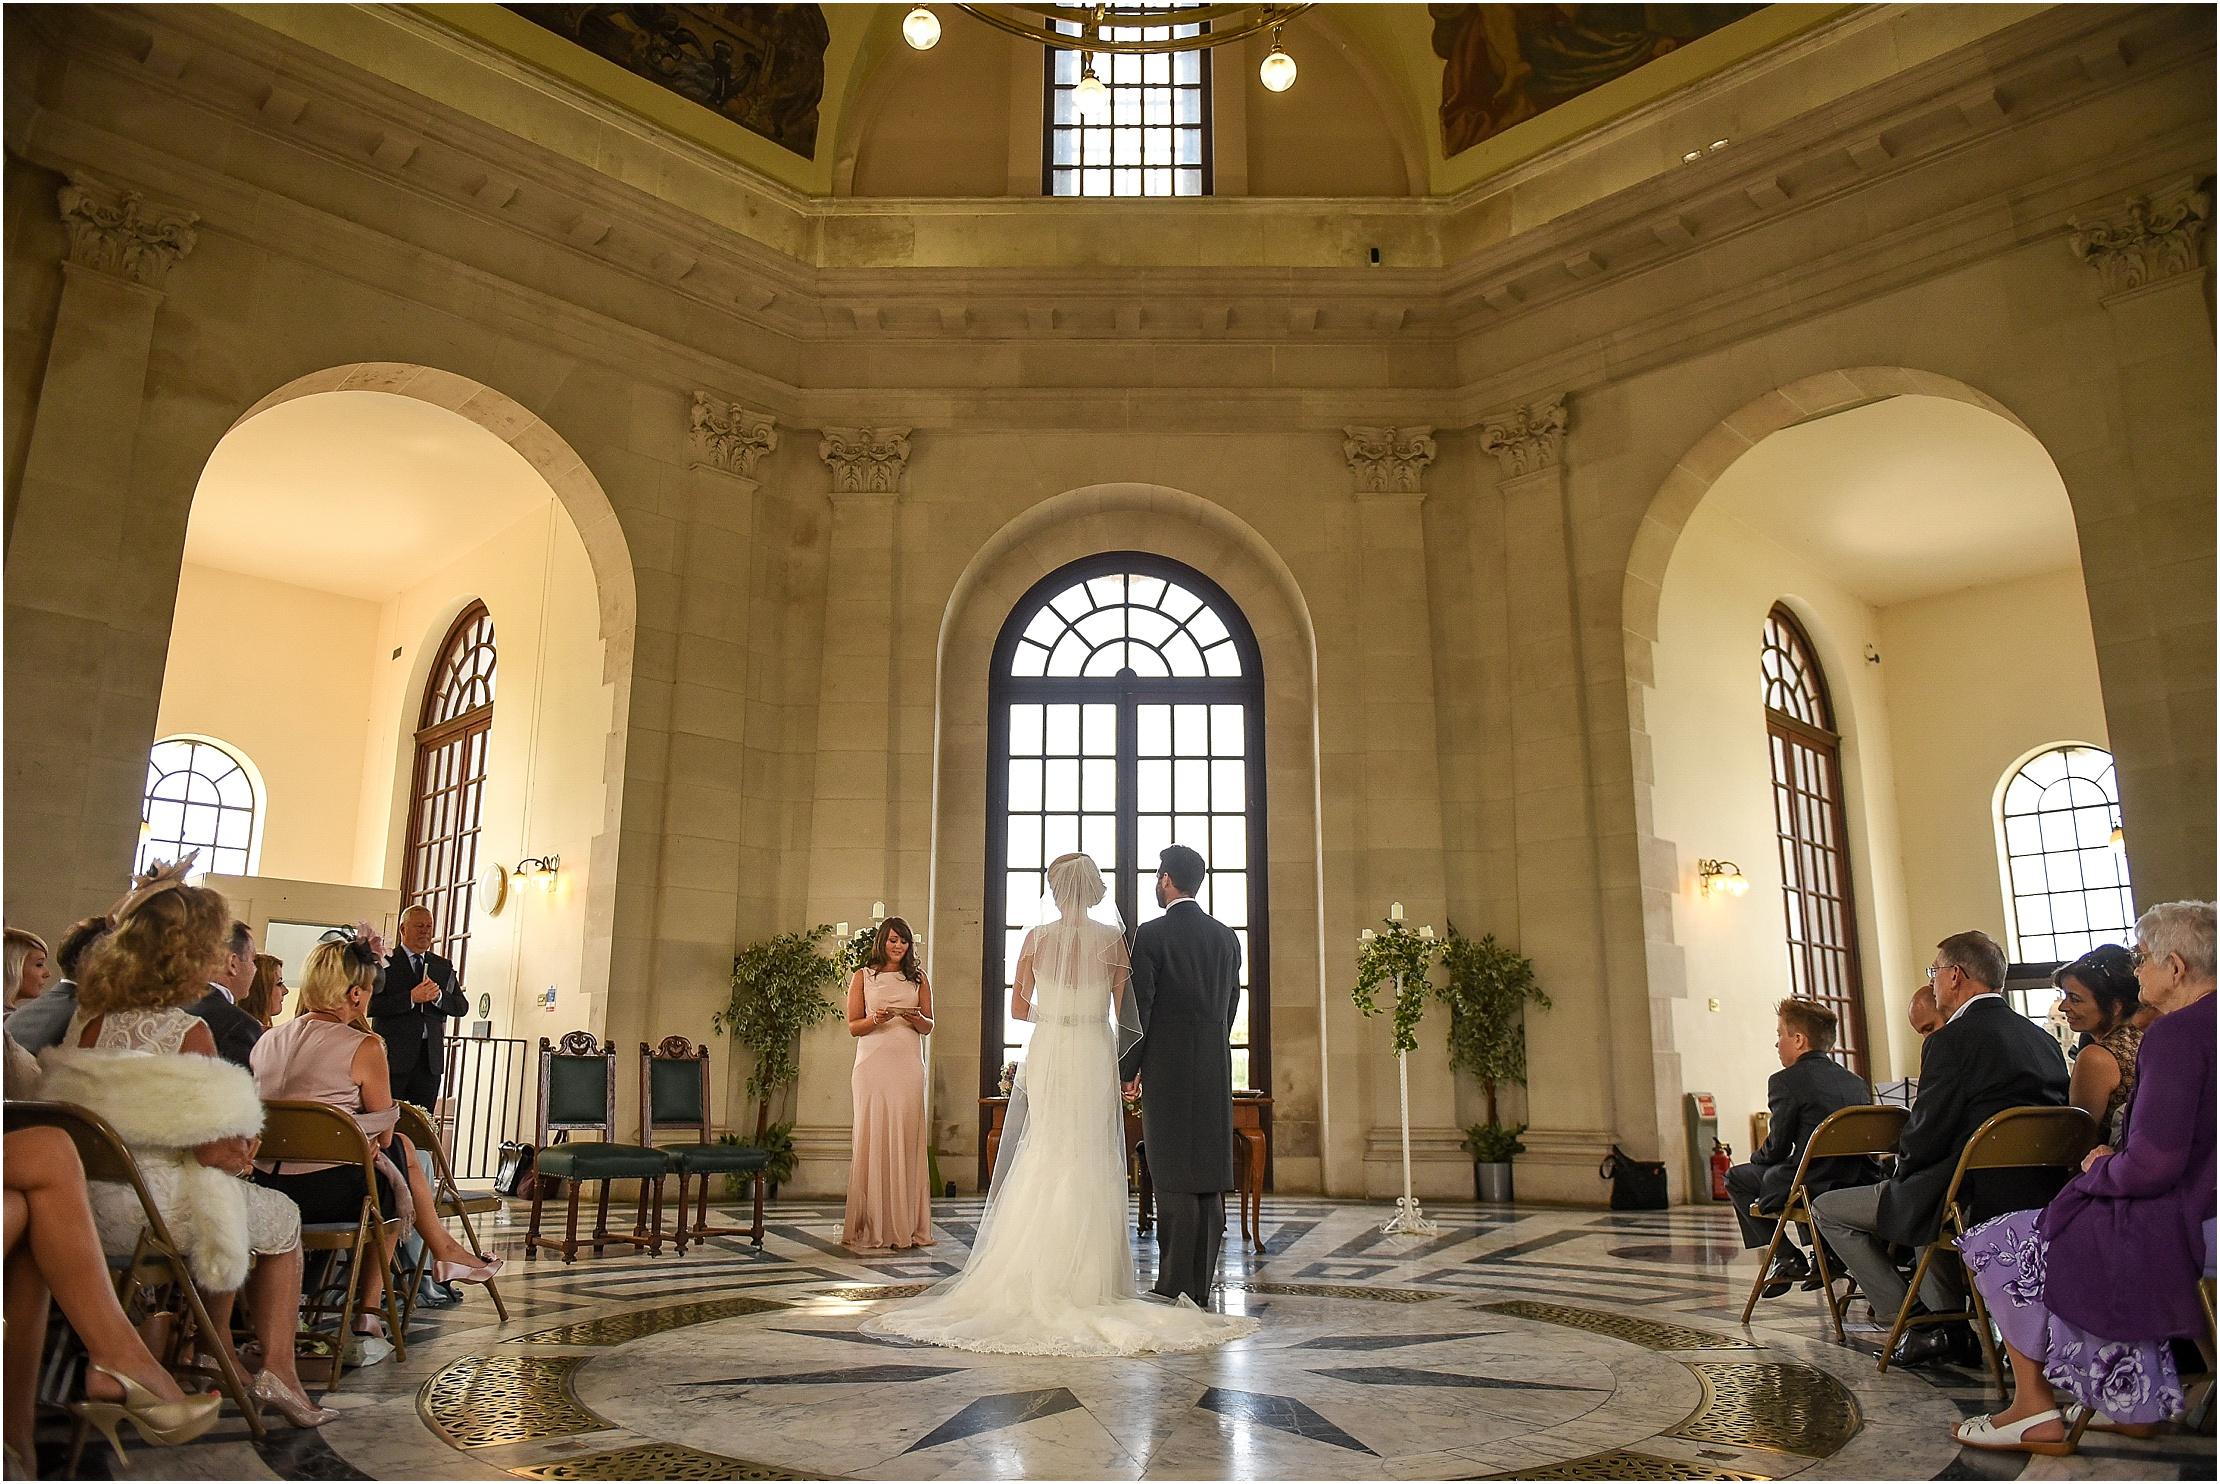 staining-lodge-wedding-060.jpg